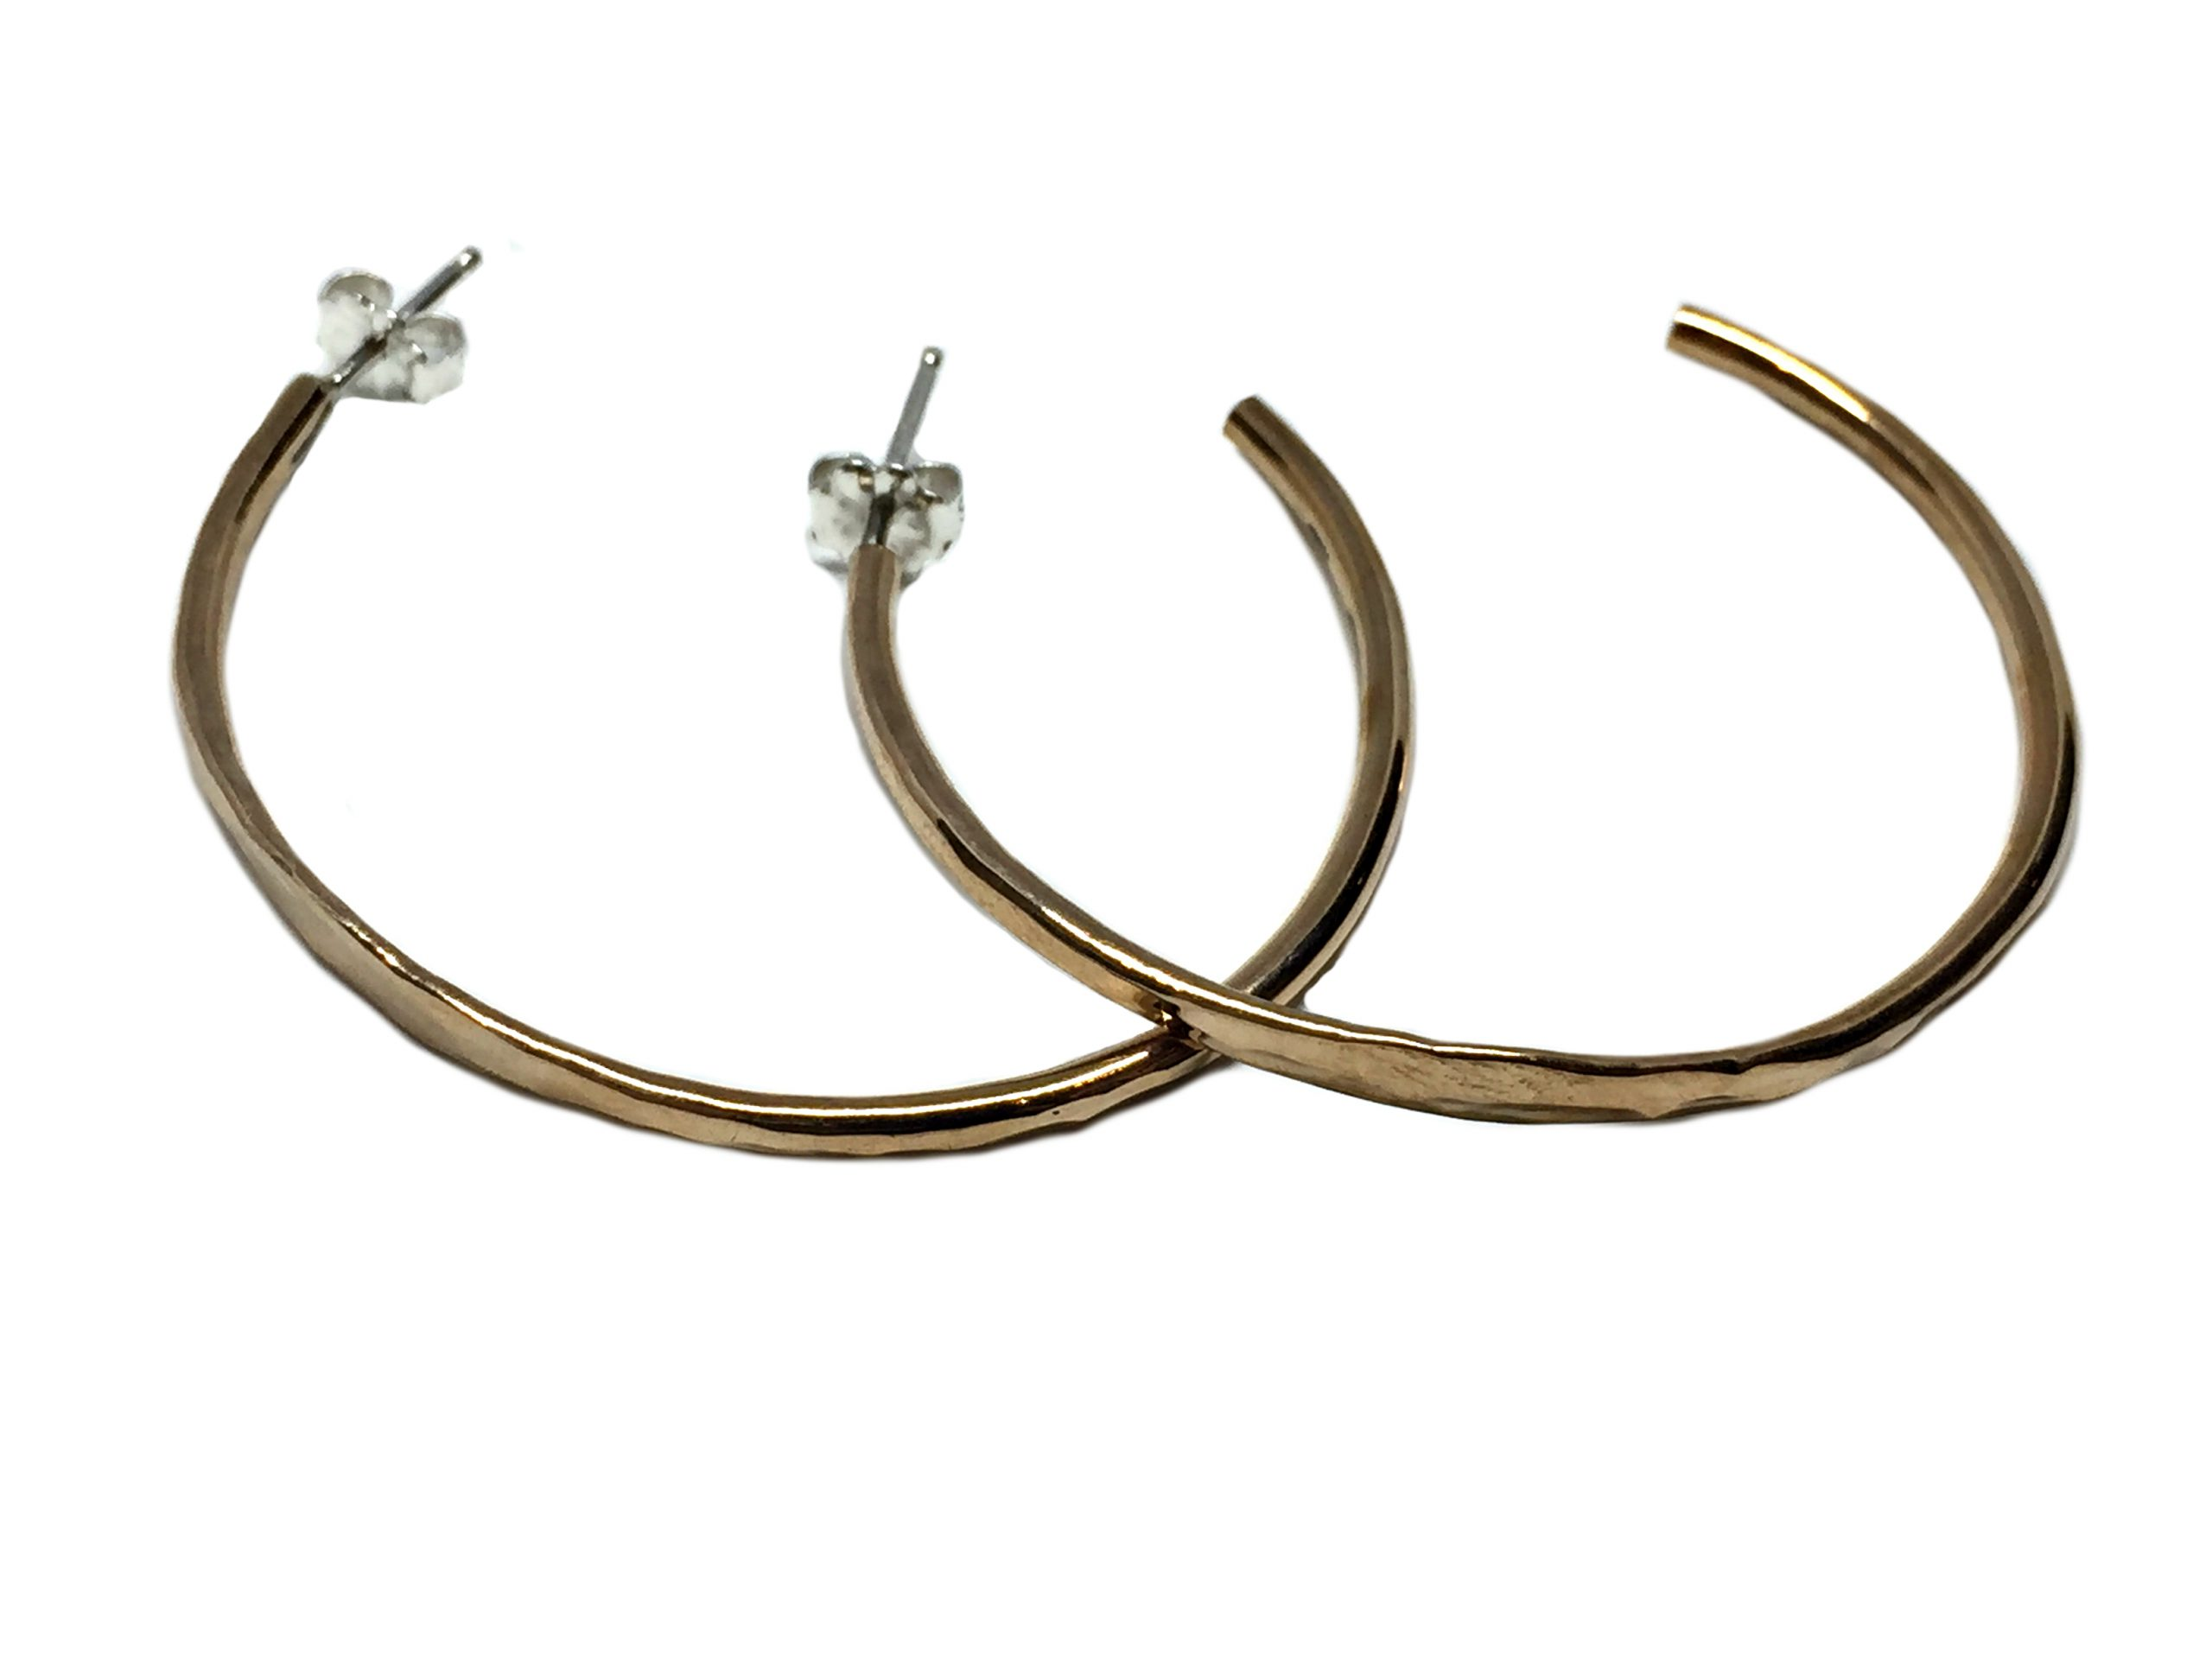 Medium Bronze Hammered Hoop Earrings by Karyn Chopik | Effusion Art Gallery + Cast Glass Studio, Invermere BC